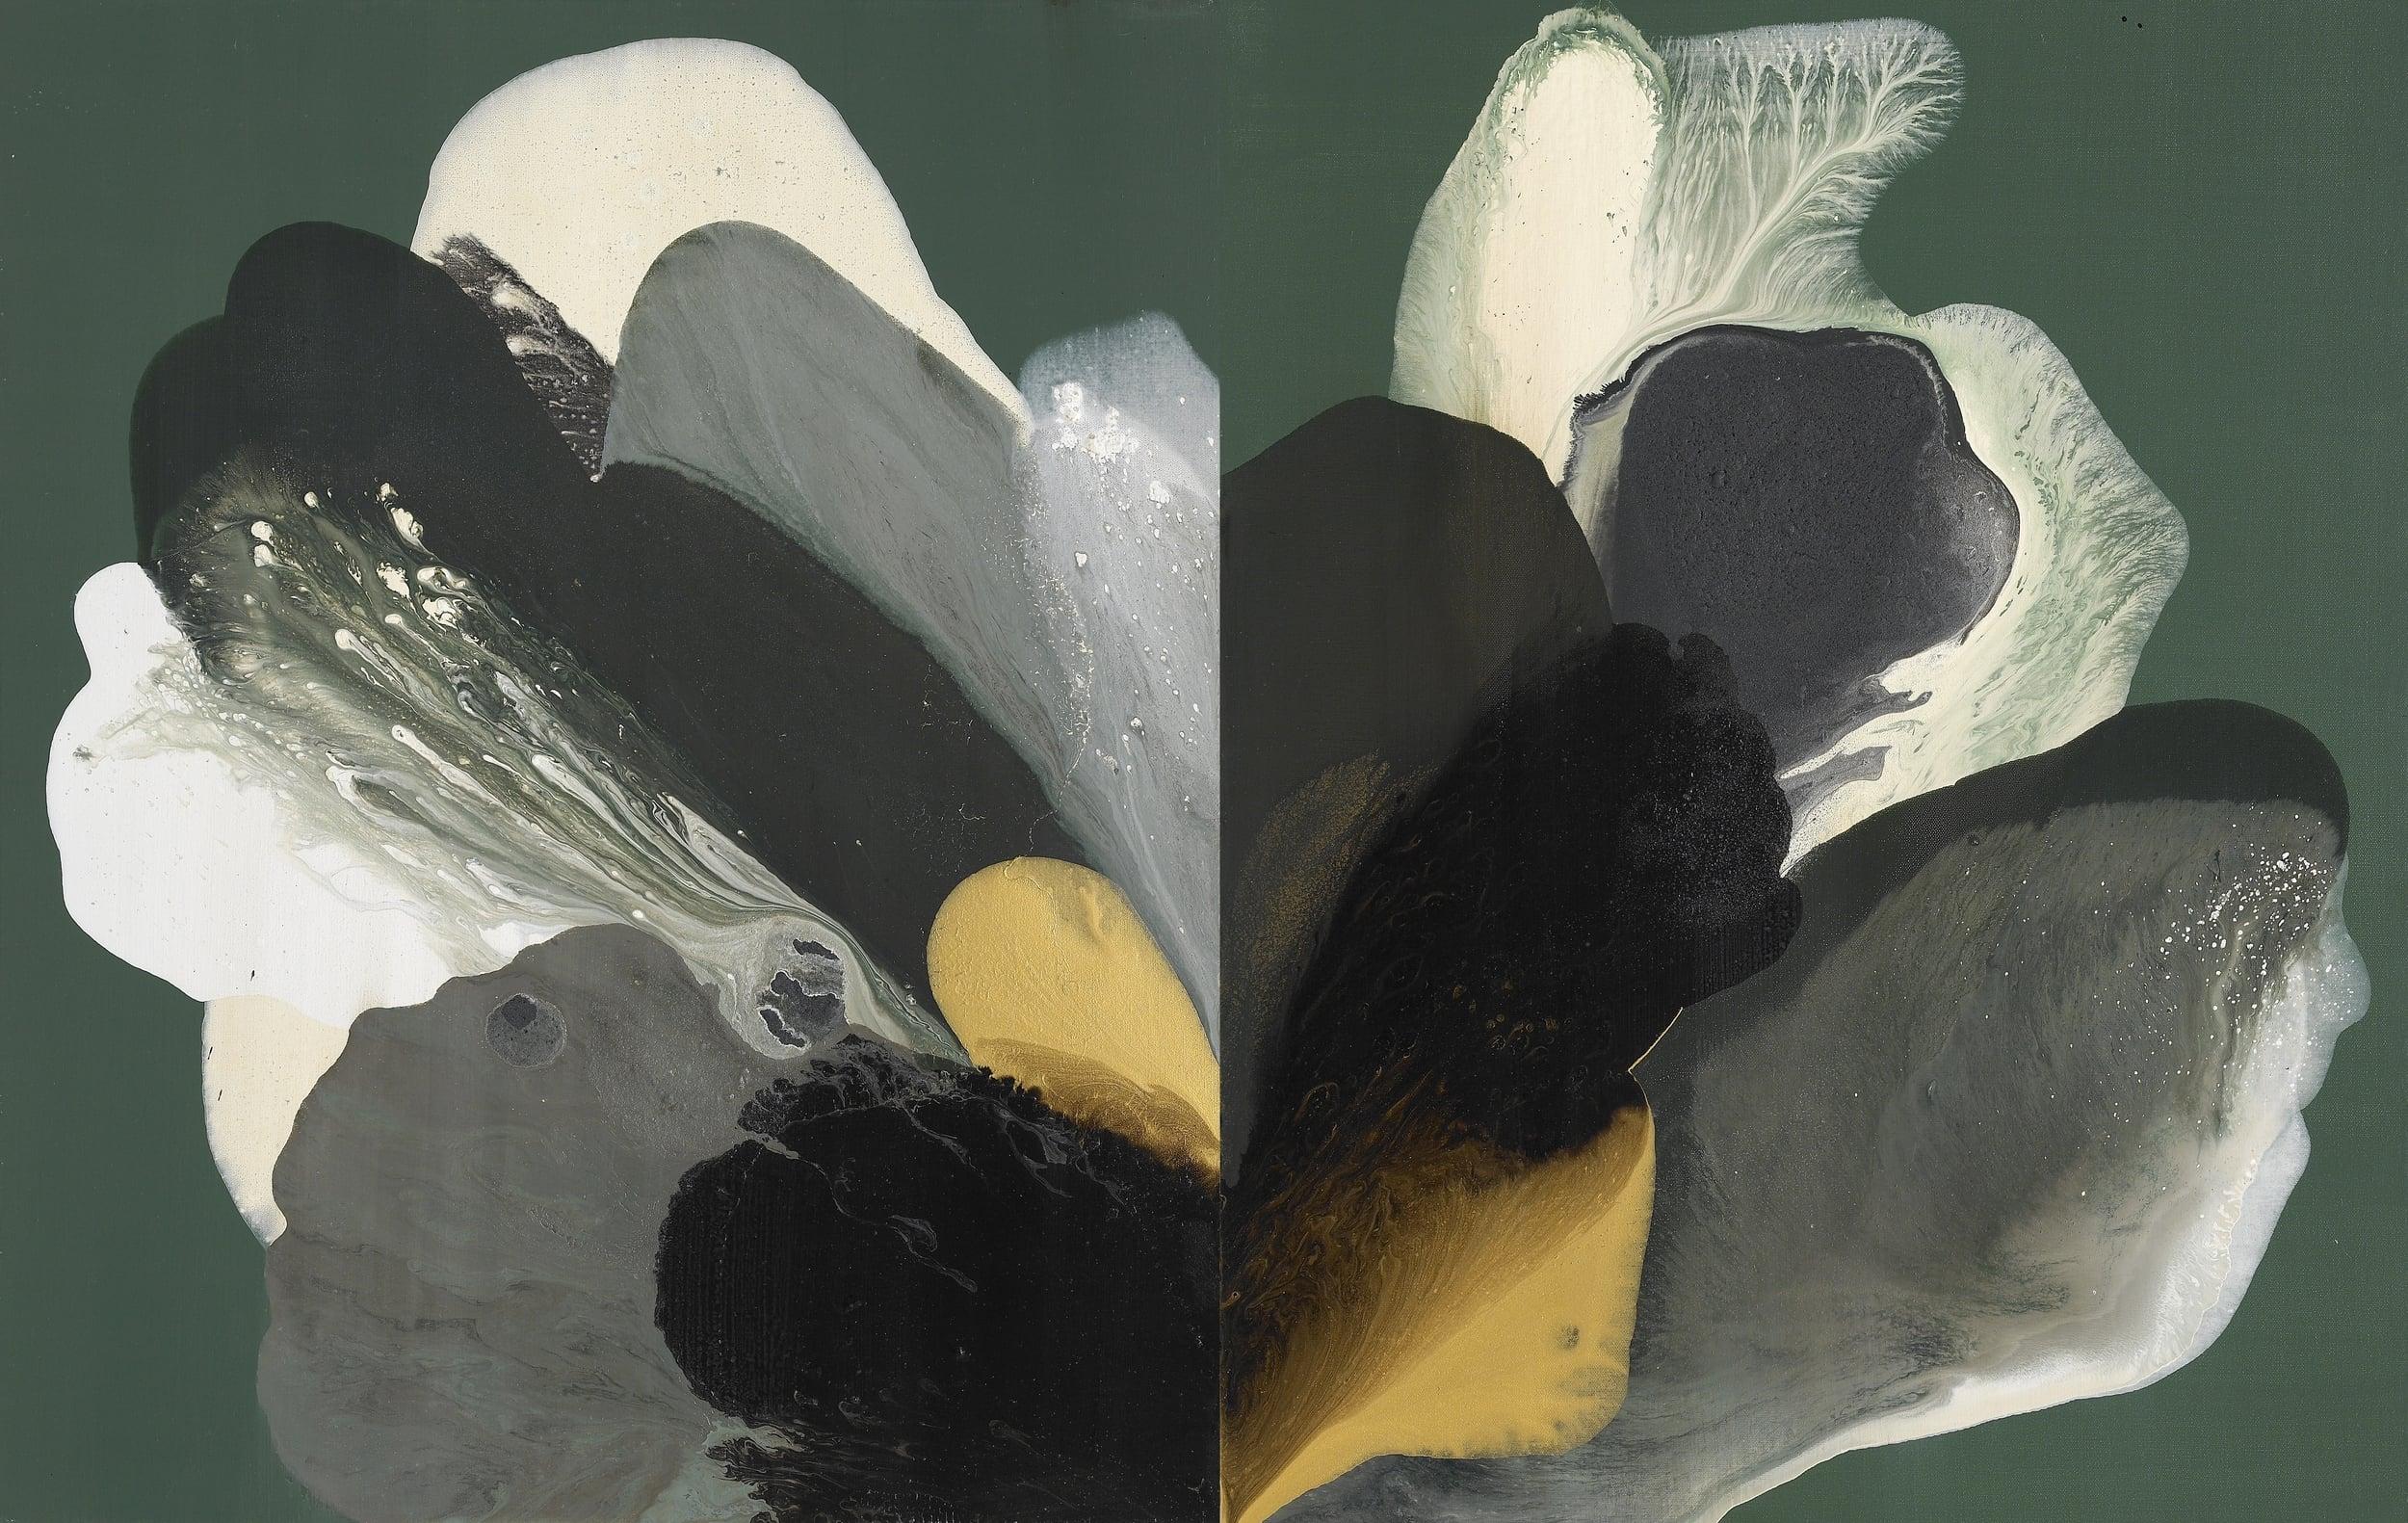 figure_12  acrylic and pumice  gel on canvas  130 cm X 162 cm  2013